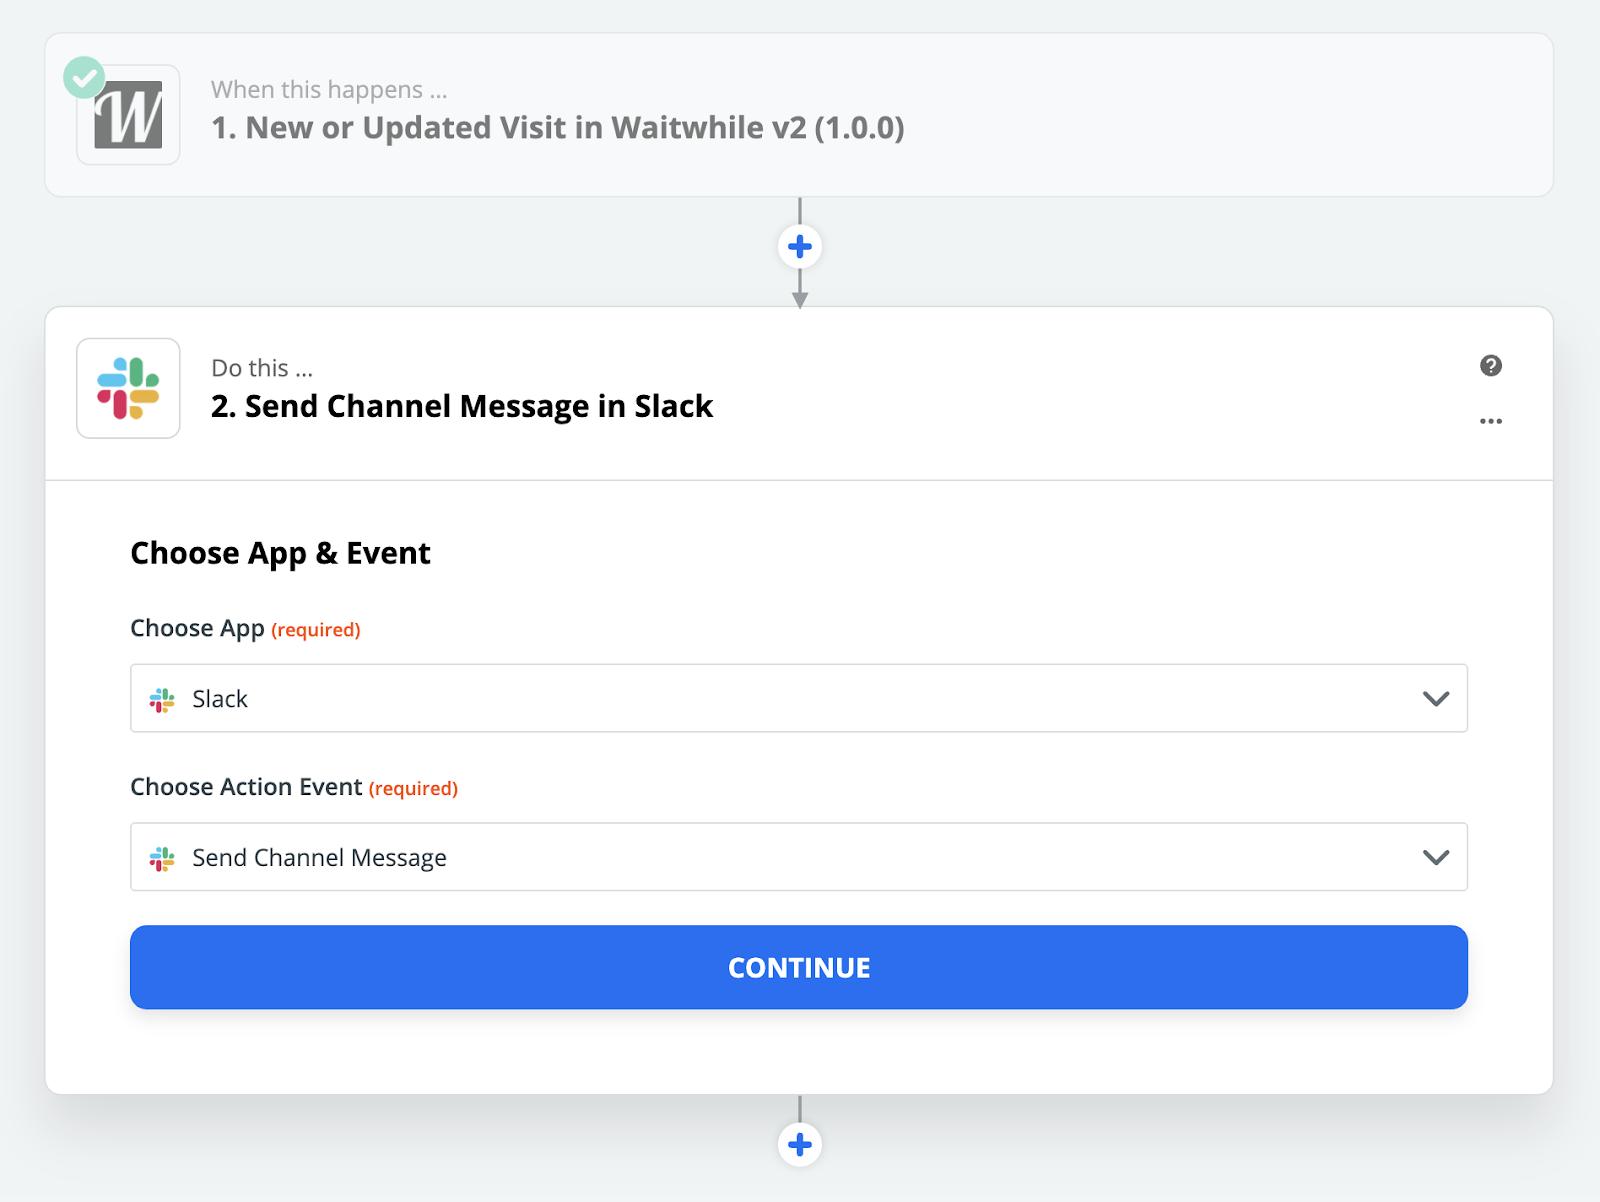 Waitwhile waitlist app screenshot of Zapier integration flow